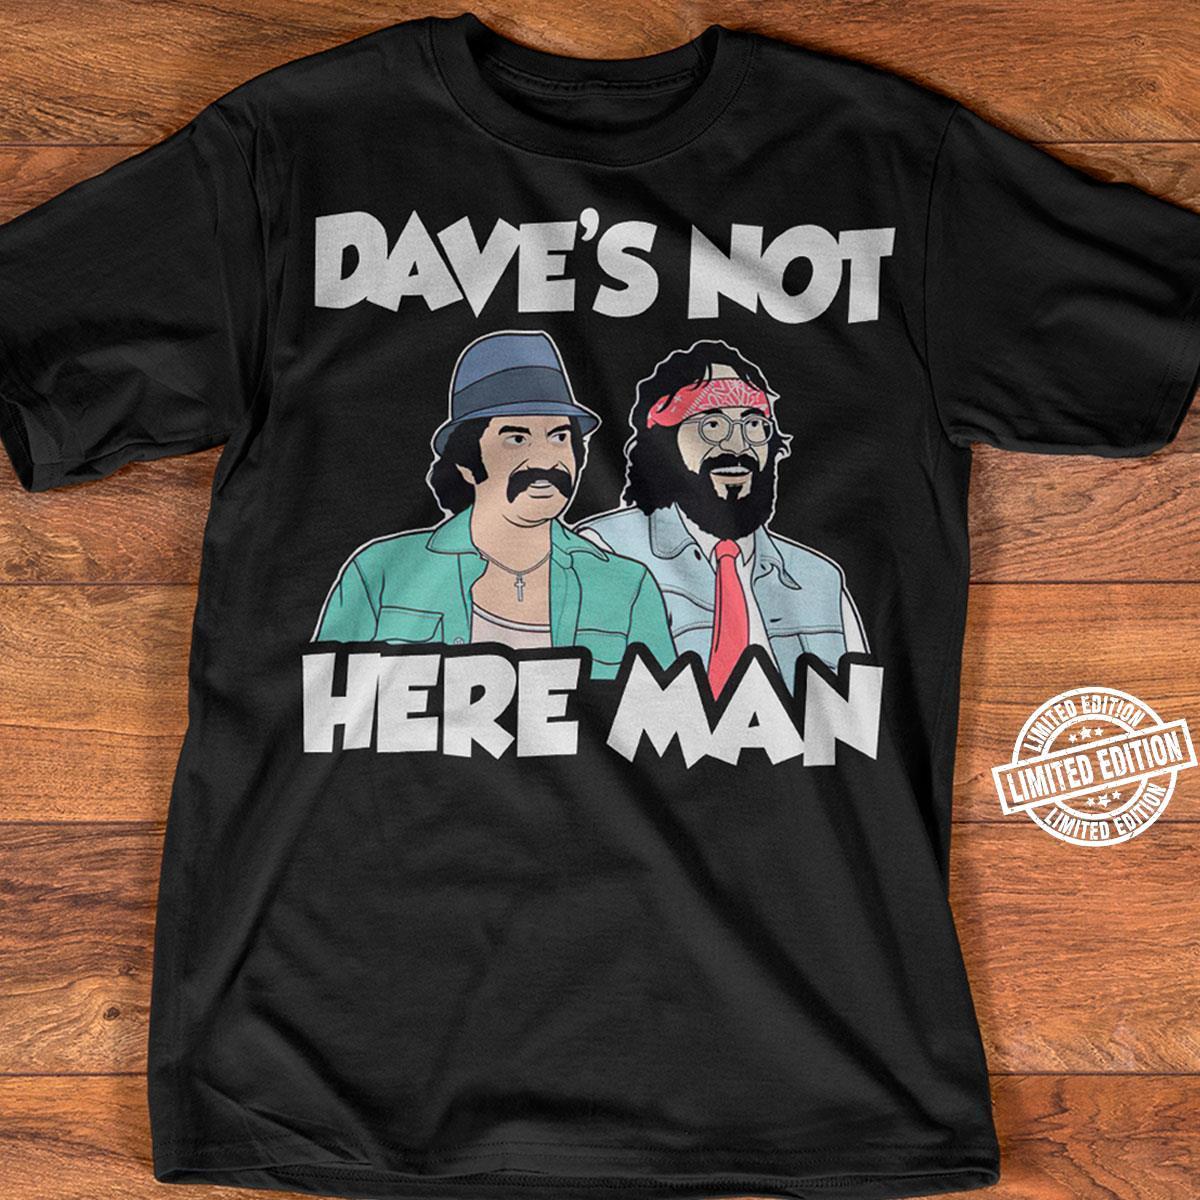 Cheech and Chong Dave's not here man shirt